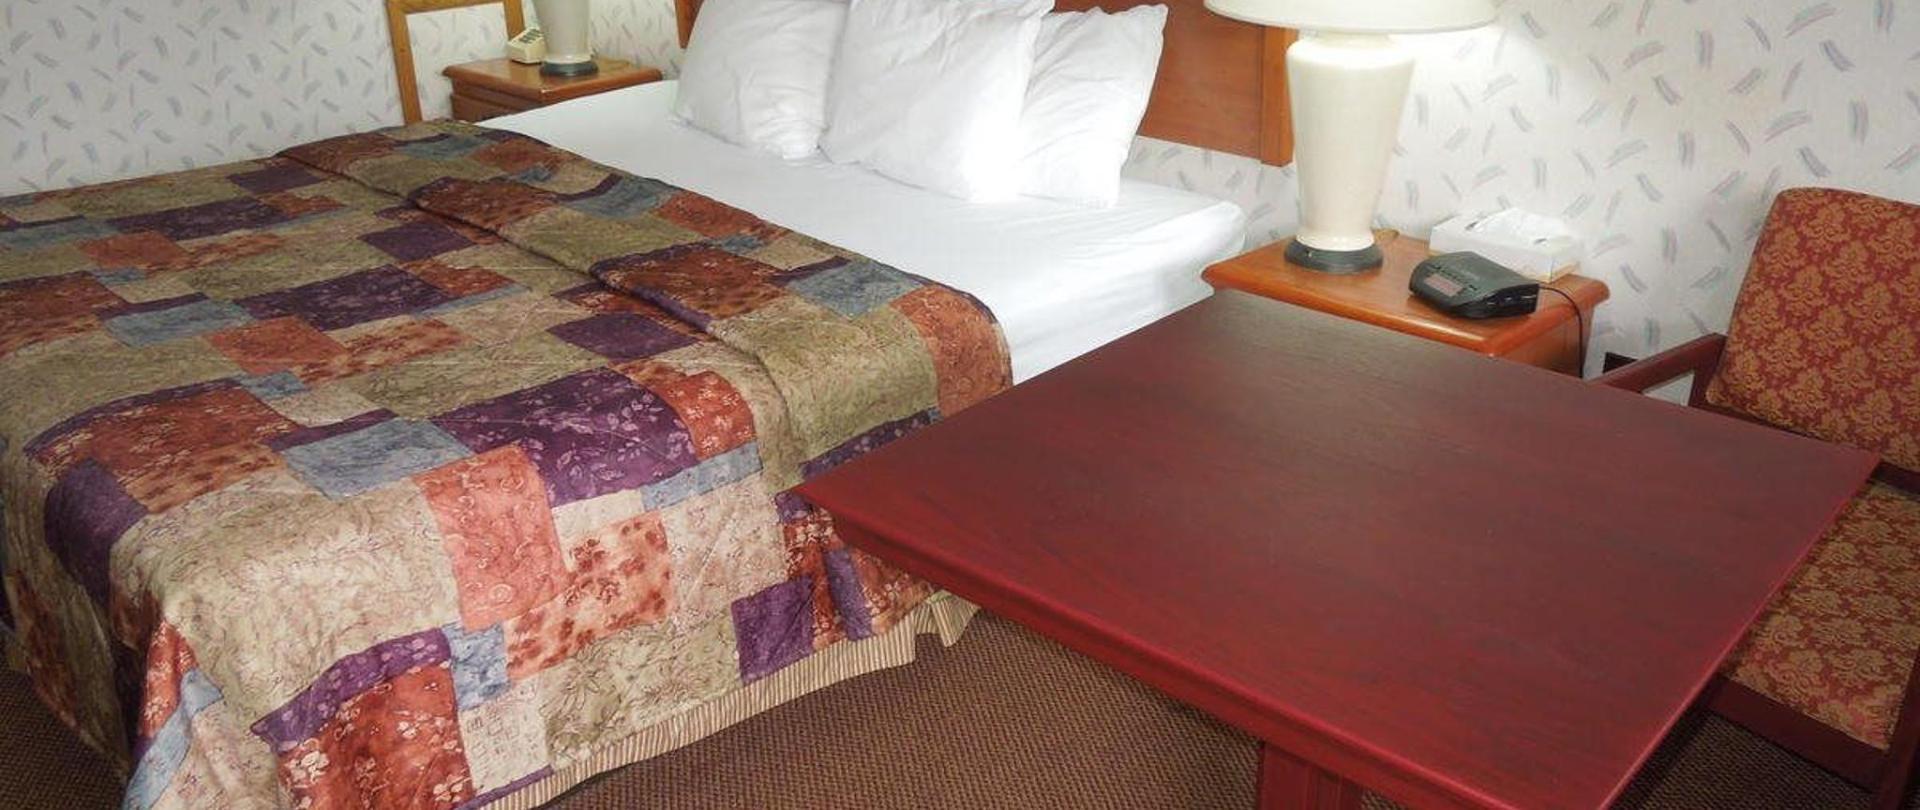 Red Carpet Inn Ronks Ronks United States Of America